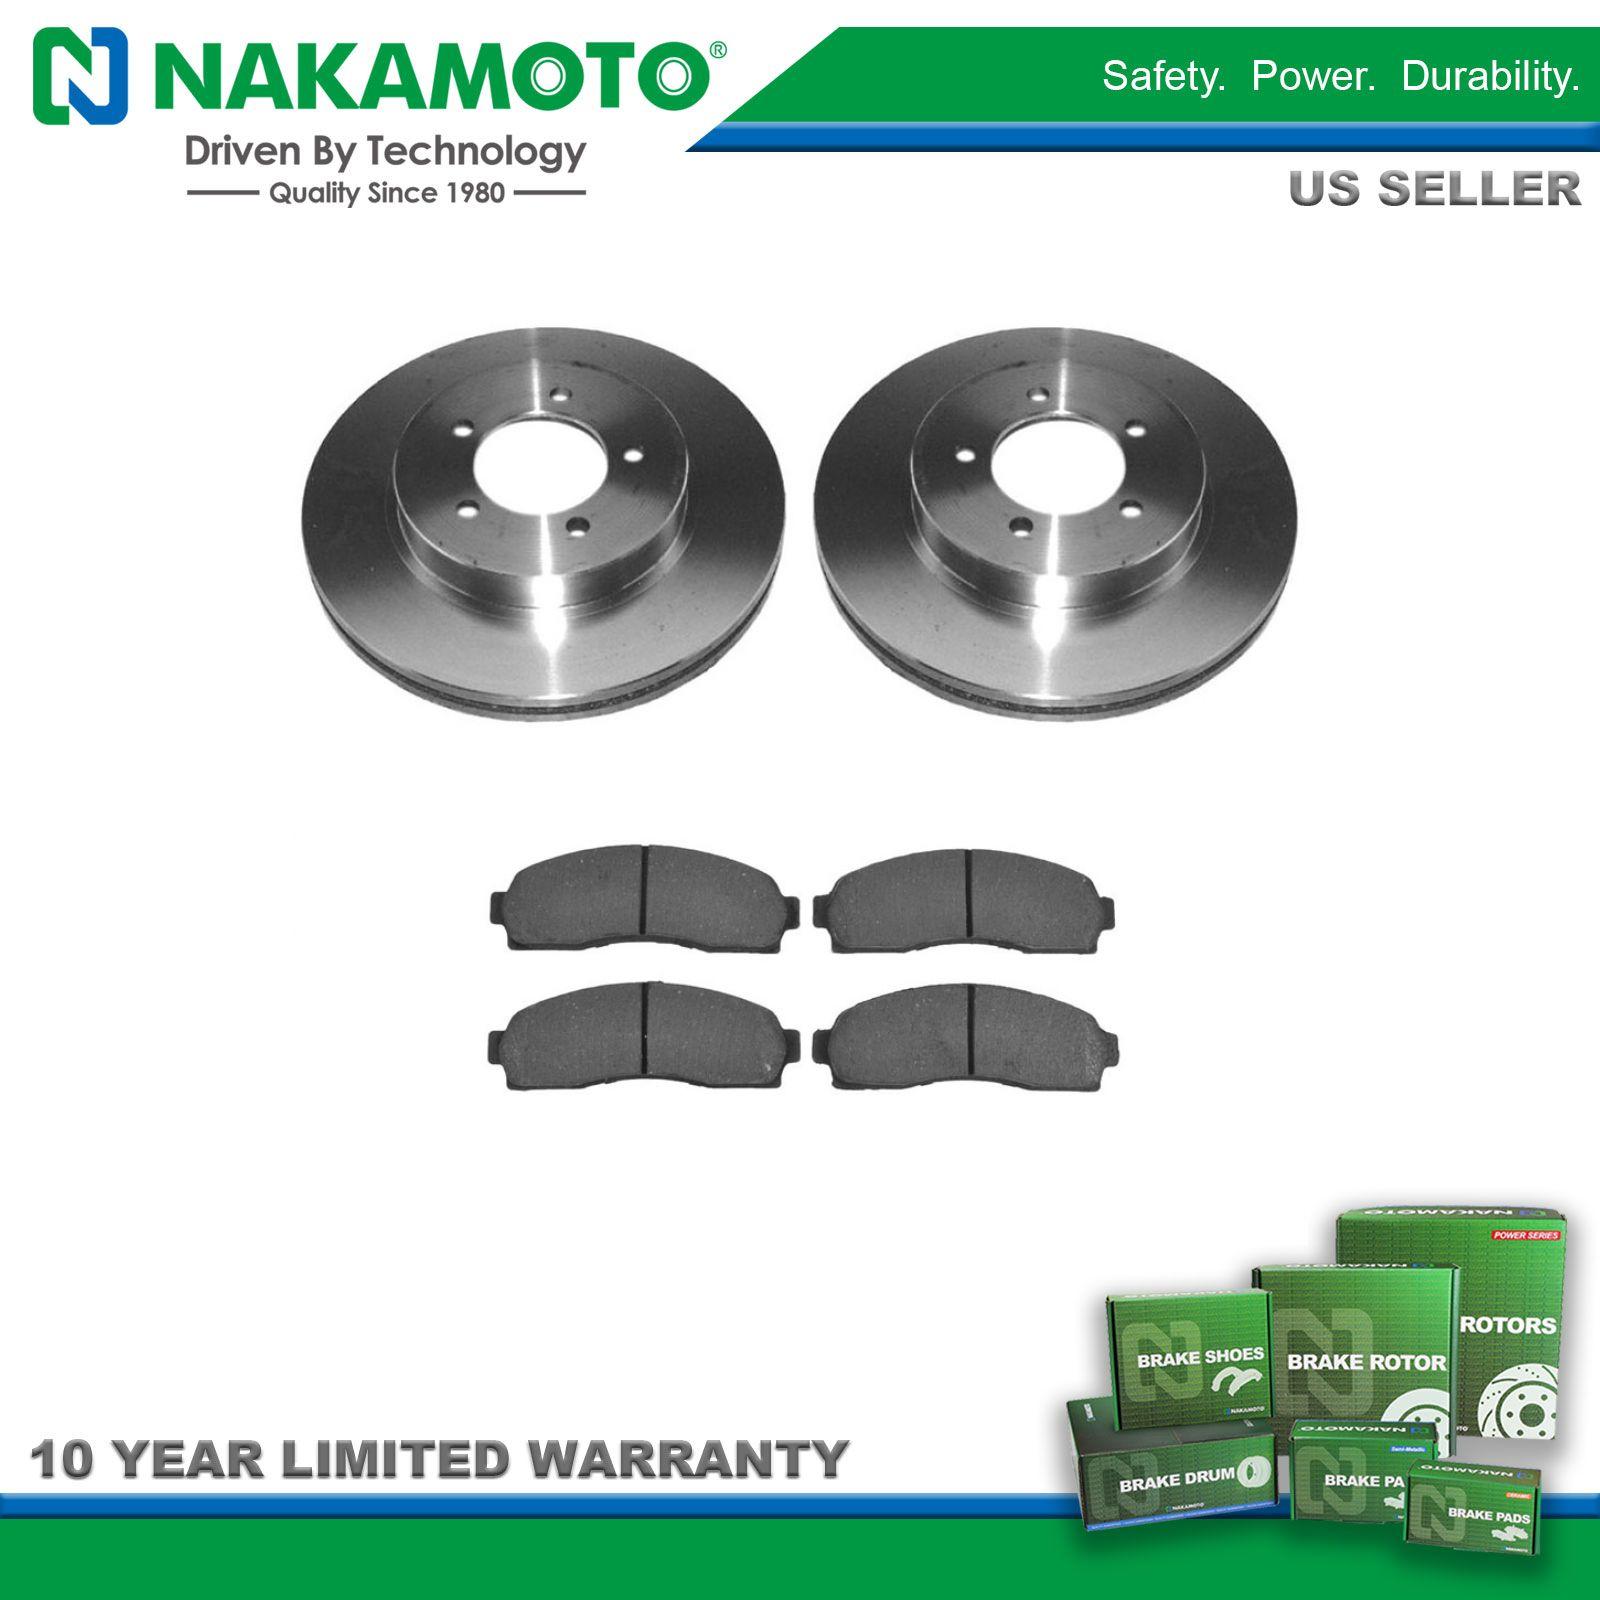 Nakamoto Front Premium Posi Ceramic Brake Pad /& Rotors Kit Set for Ford Mercury